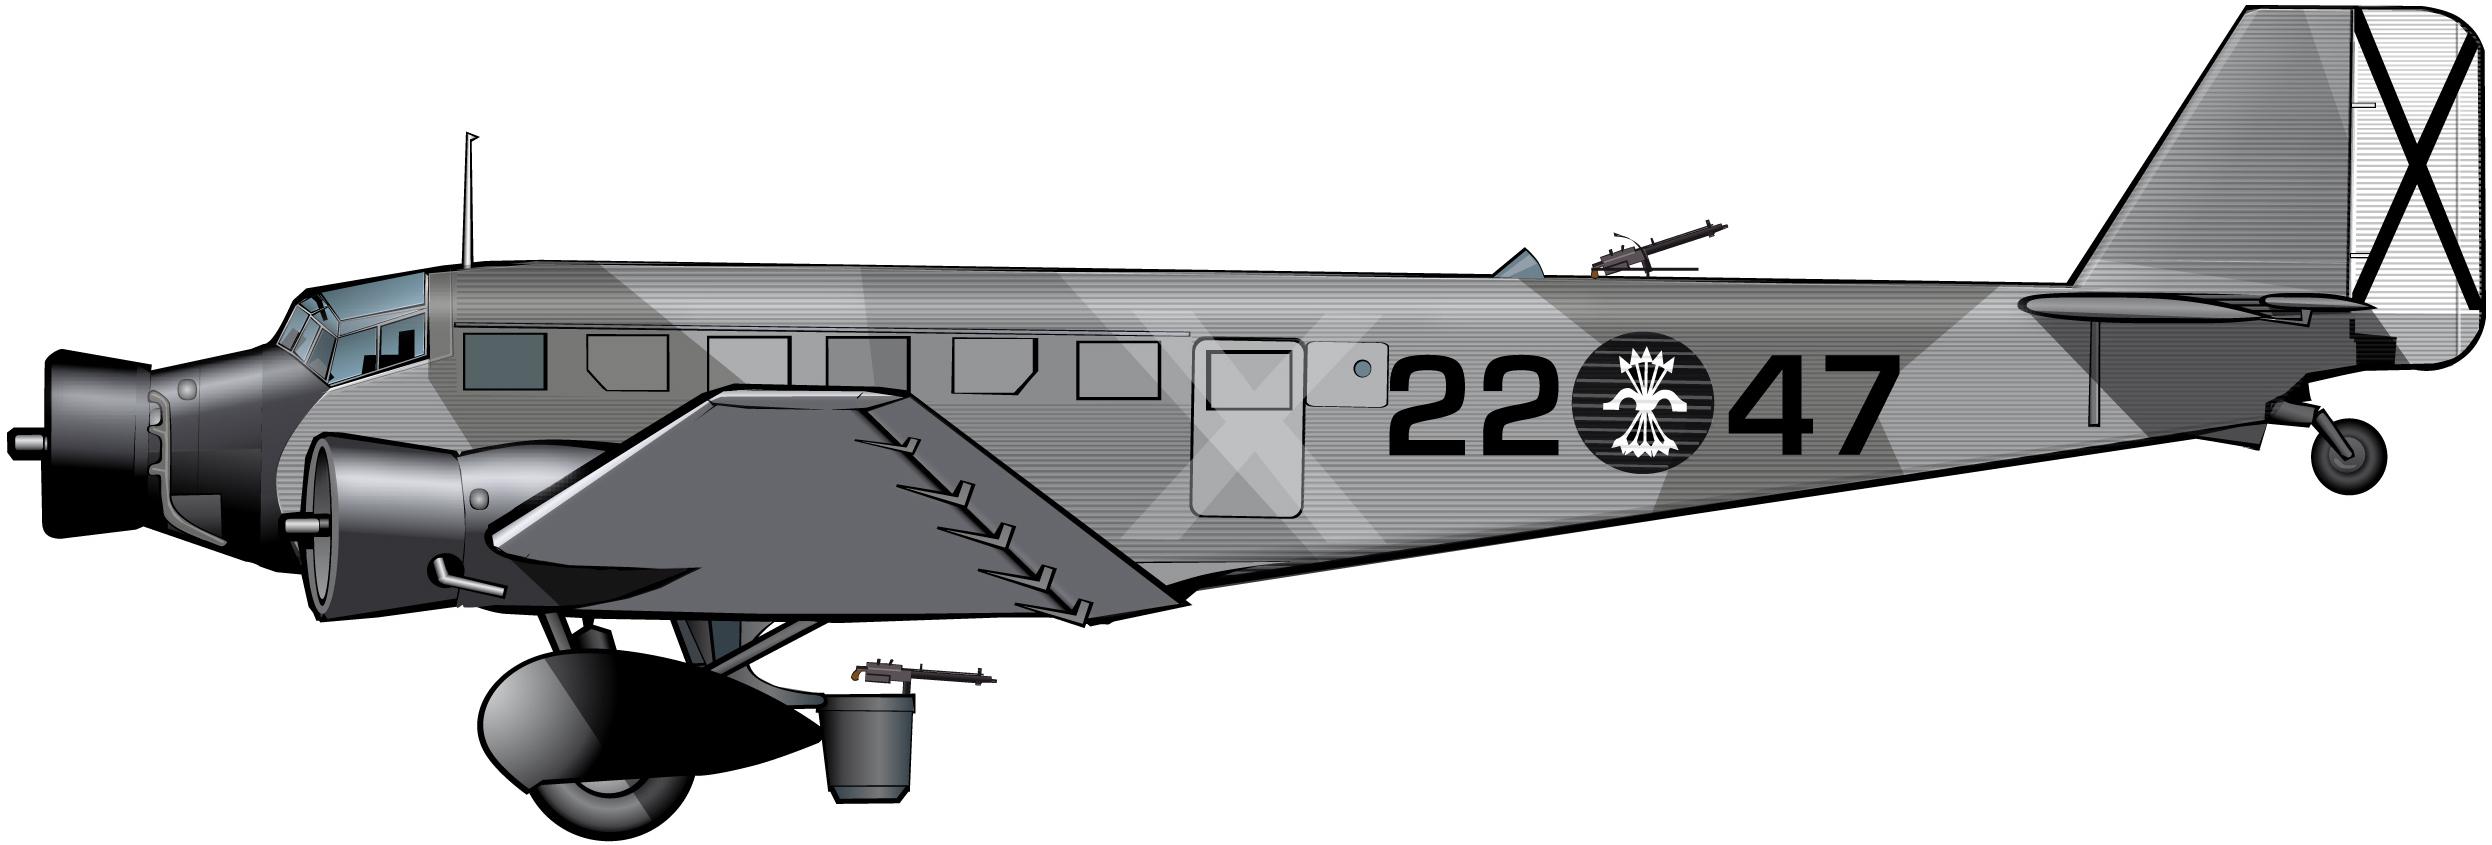 junkersju52bombardero193637